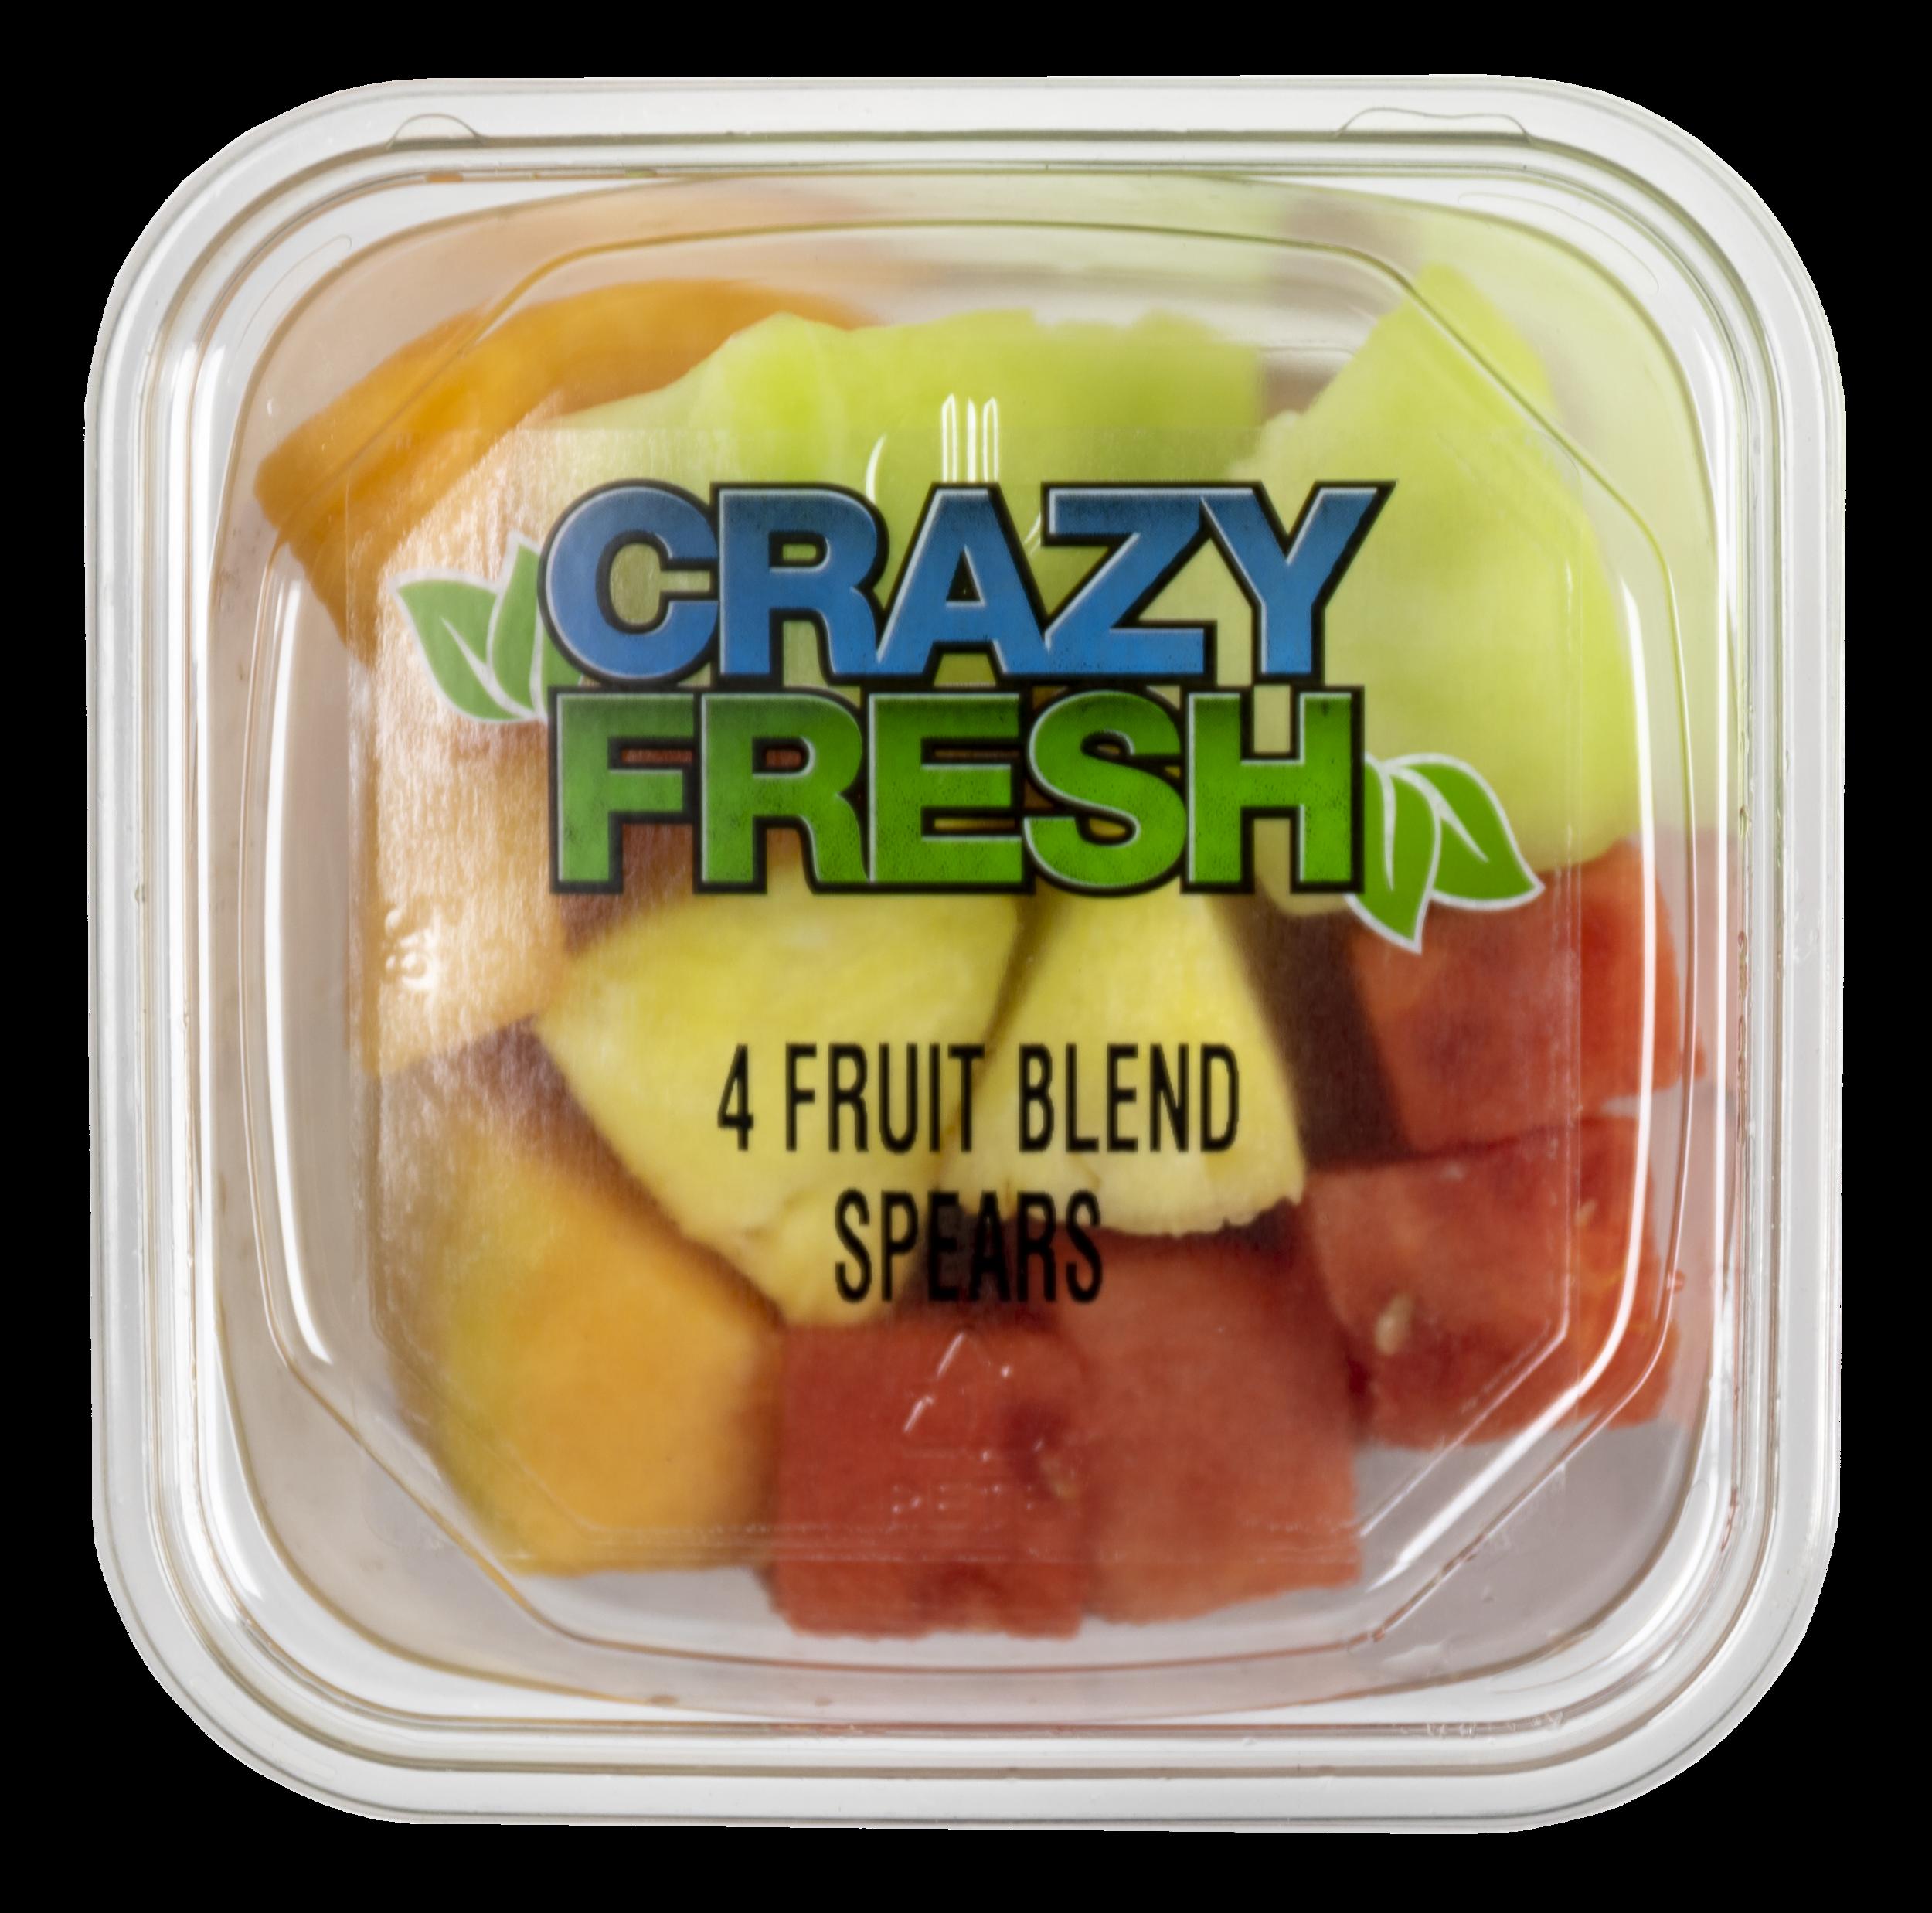 4fruit blend spears.png